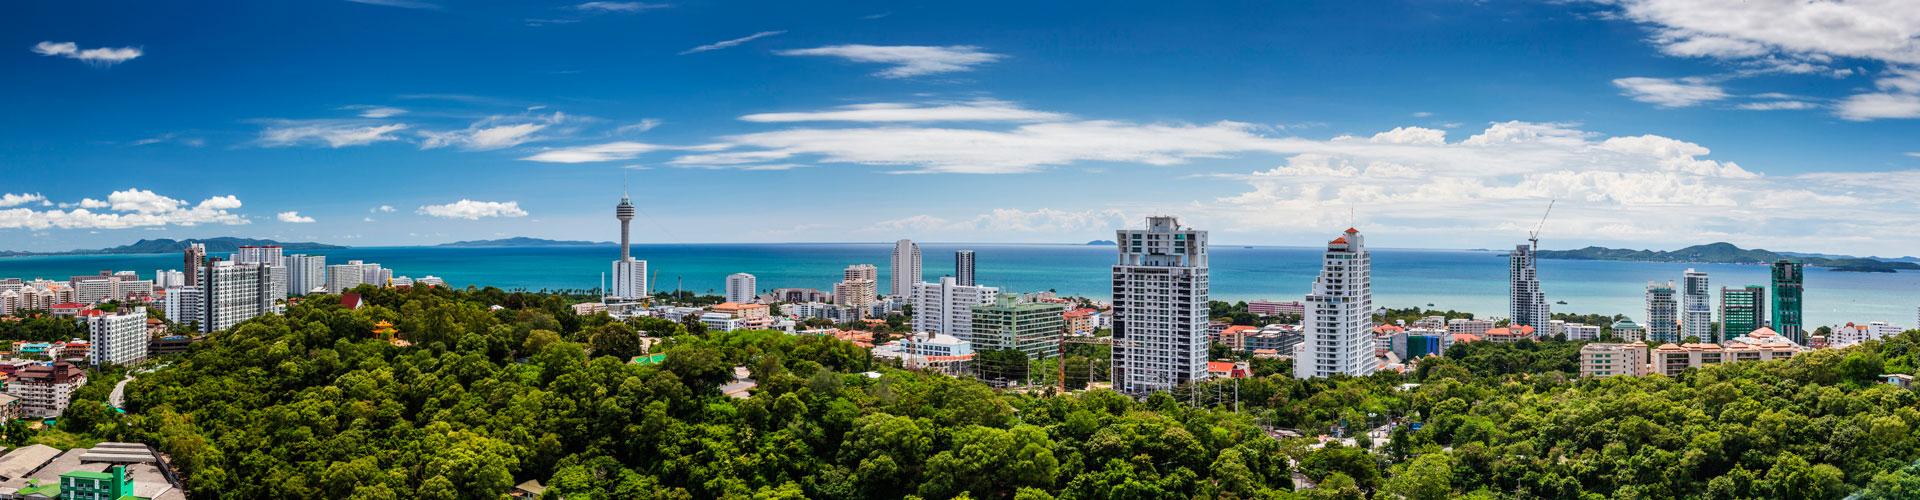 Pattaya Hill, Pattaya, Thailand